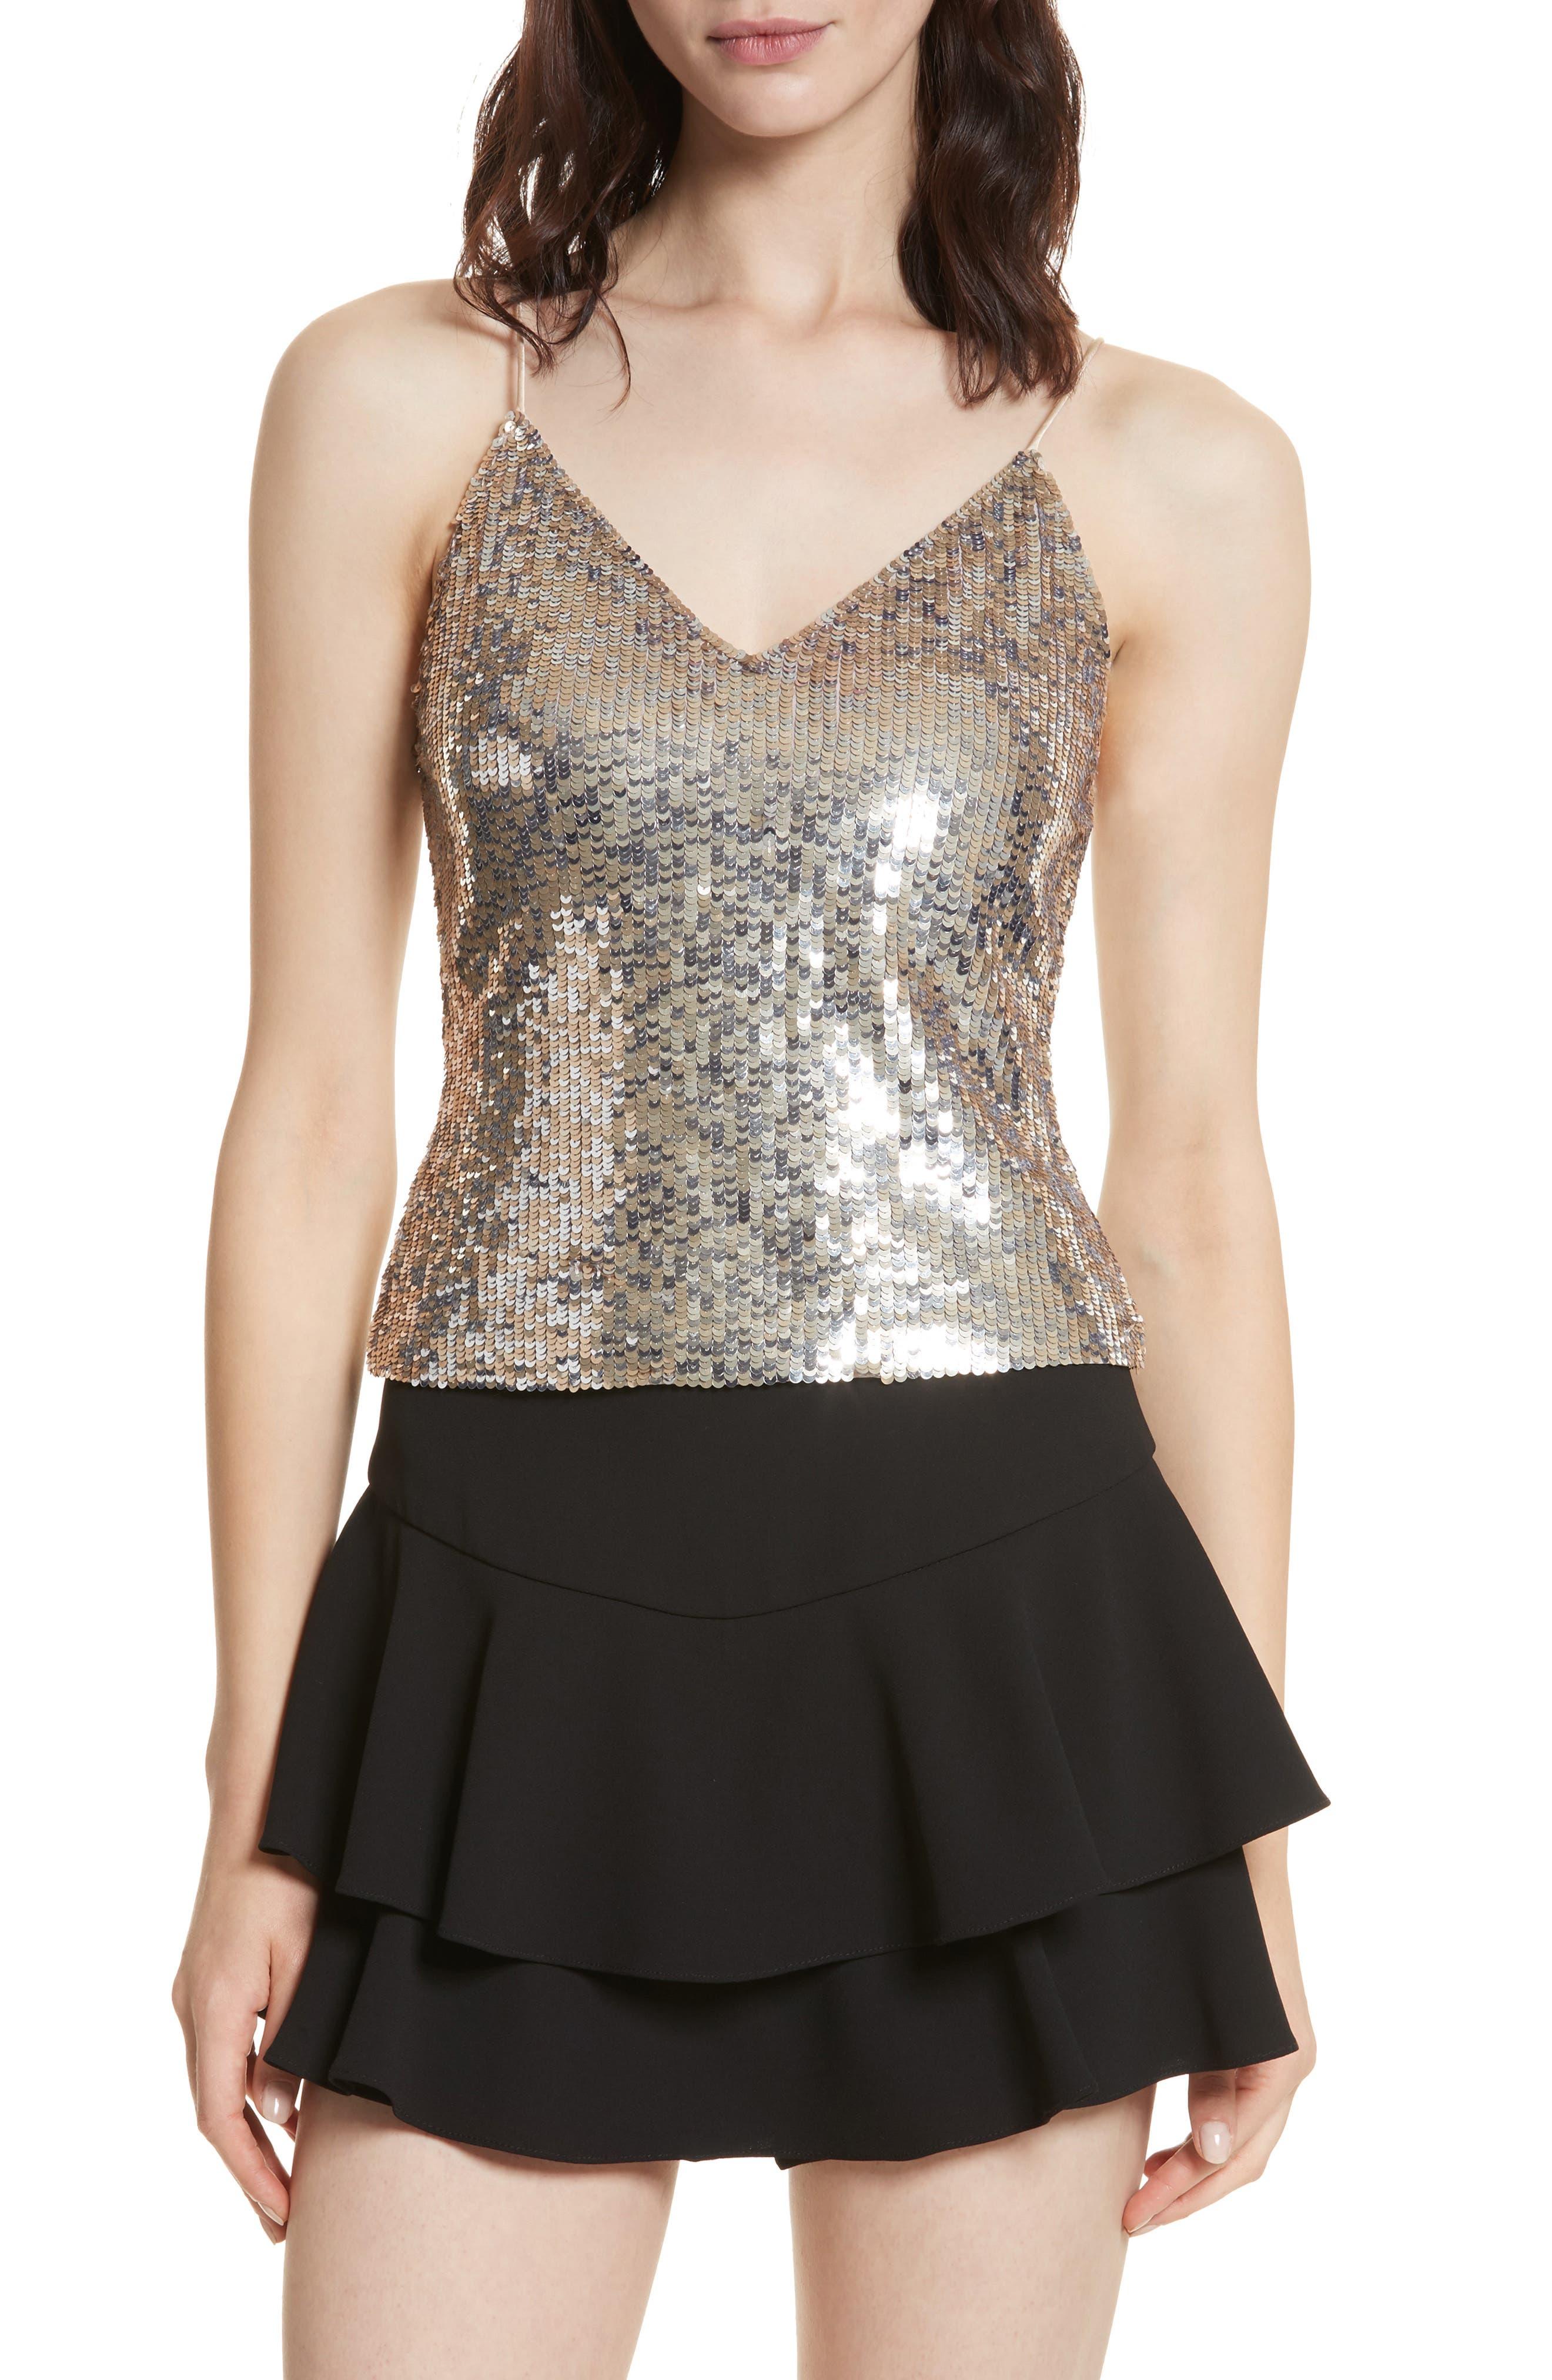 Main Image - Alice + Olivia Delray Sequin Embellished Camisole